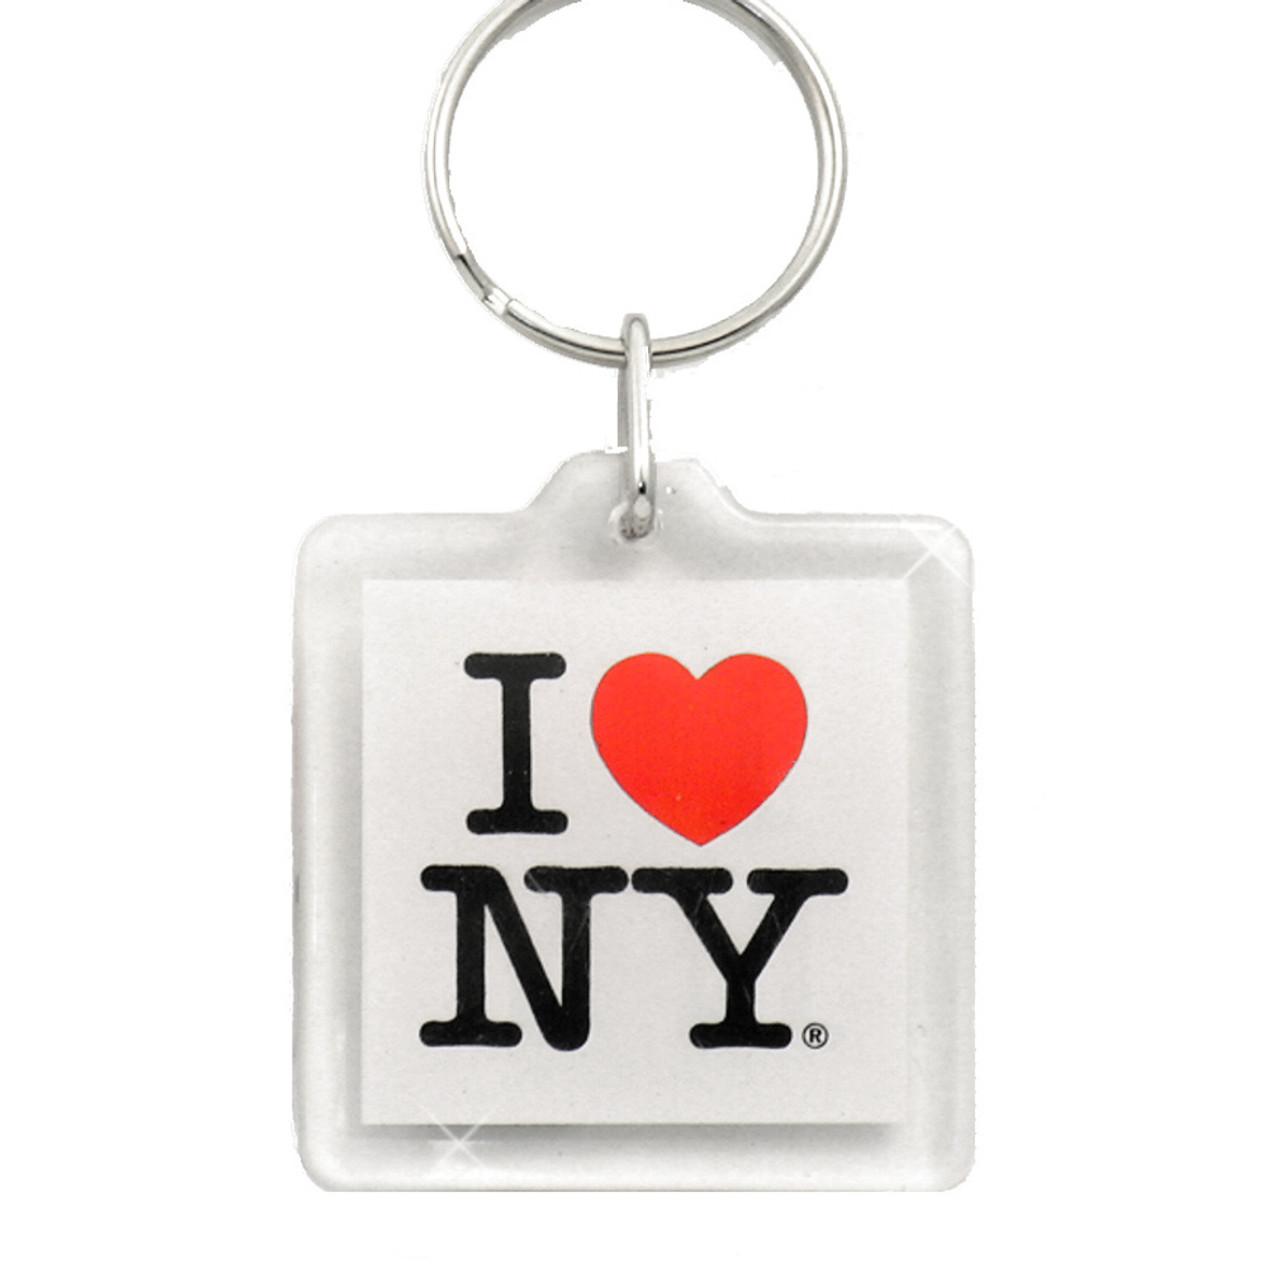 I love ny plastic key chain altavistaventures Choice Image